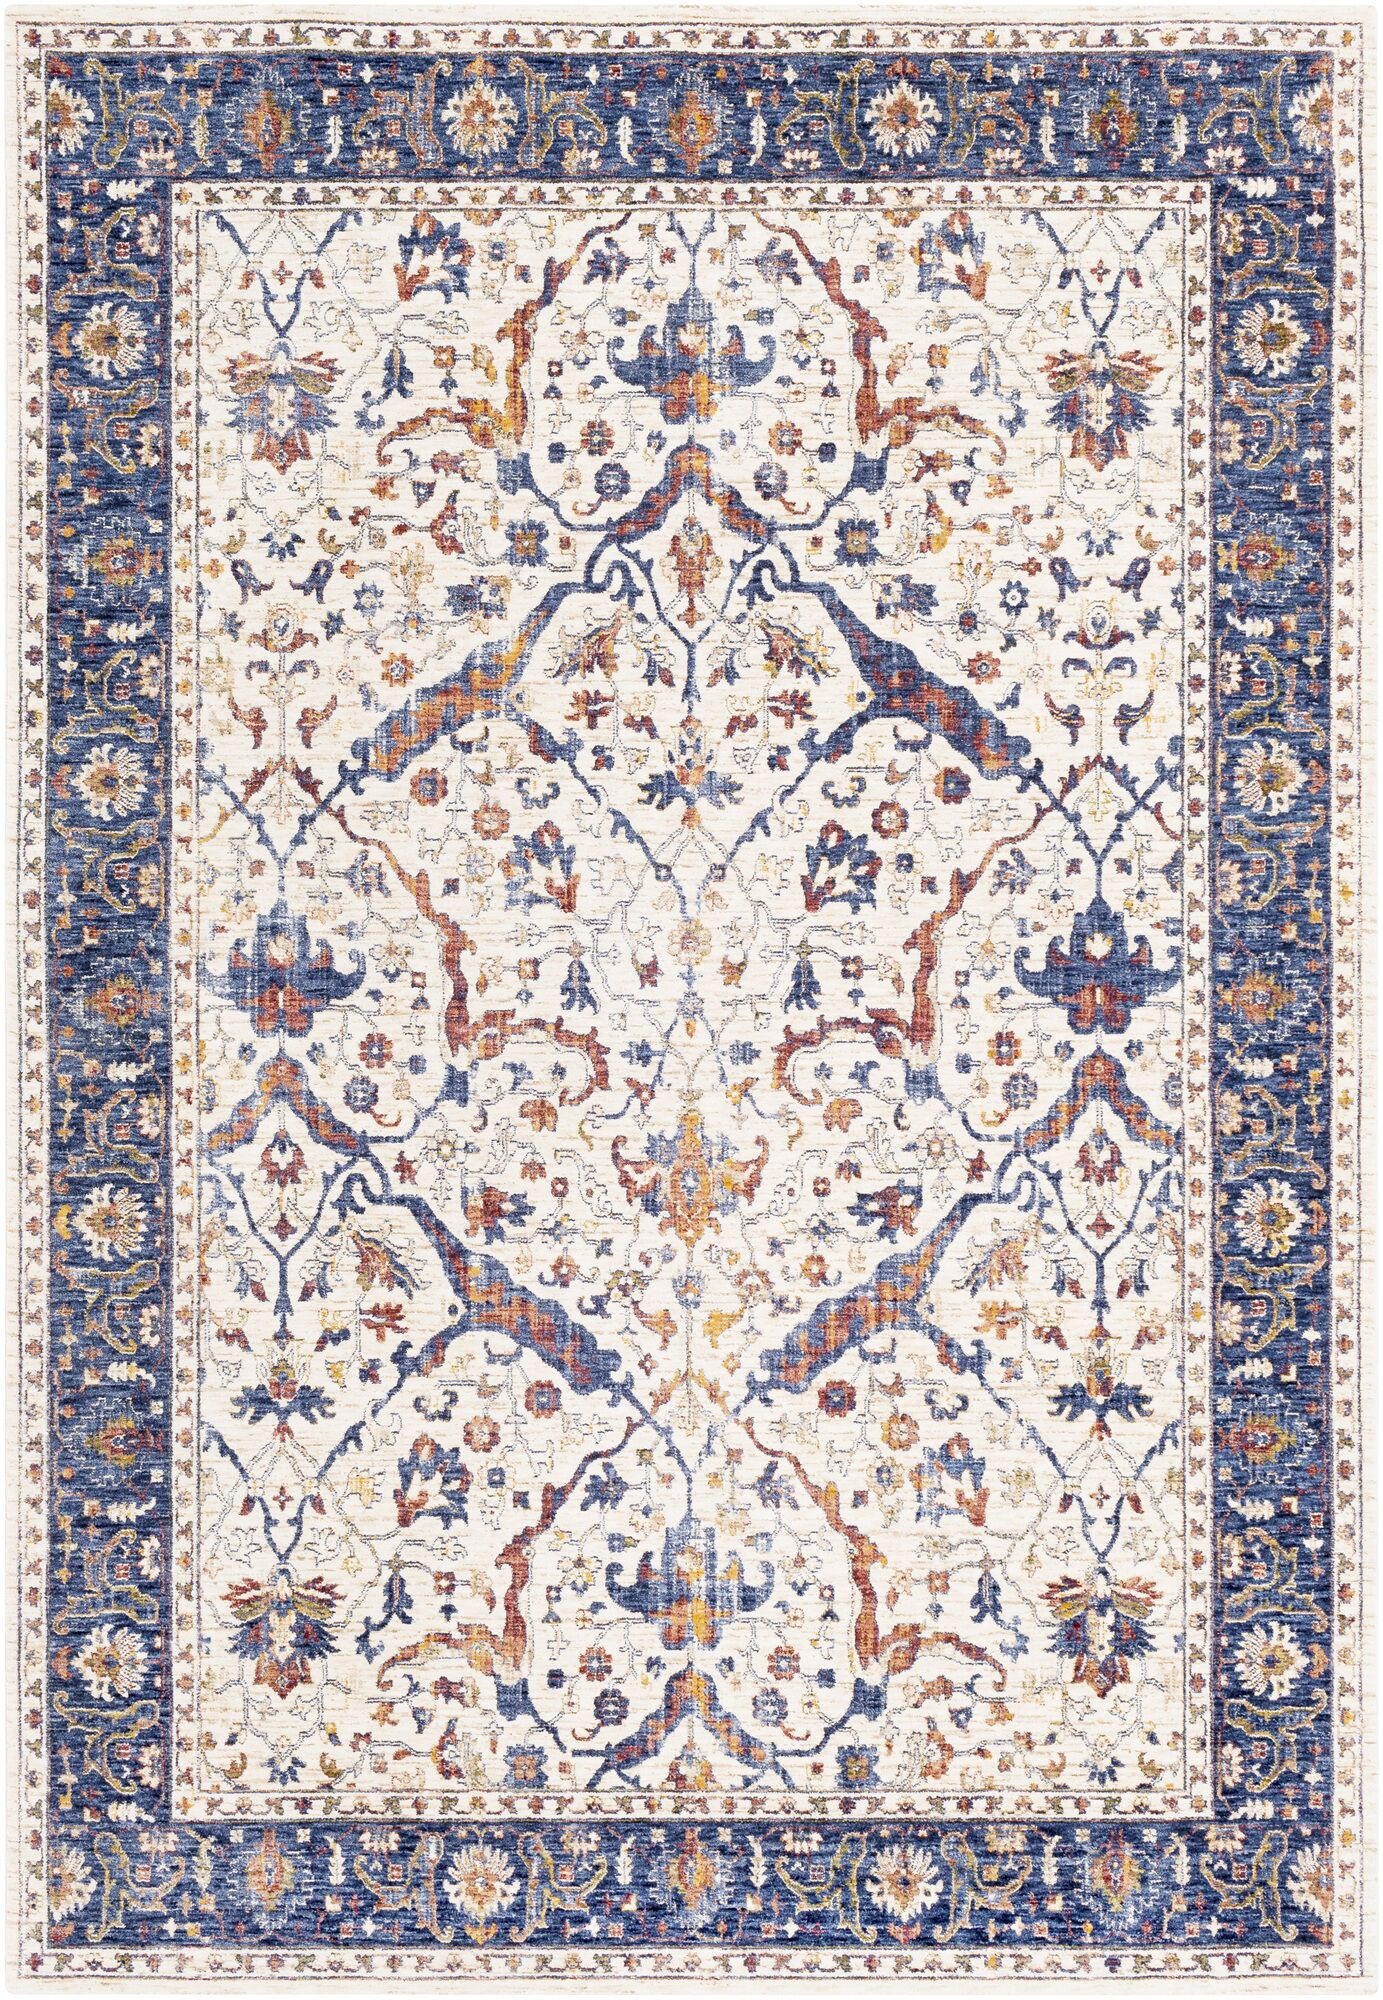 Richmond West Vintage Floral Ivory/Blue Area Rug Rug Size: Rectangle 3' x 5'